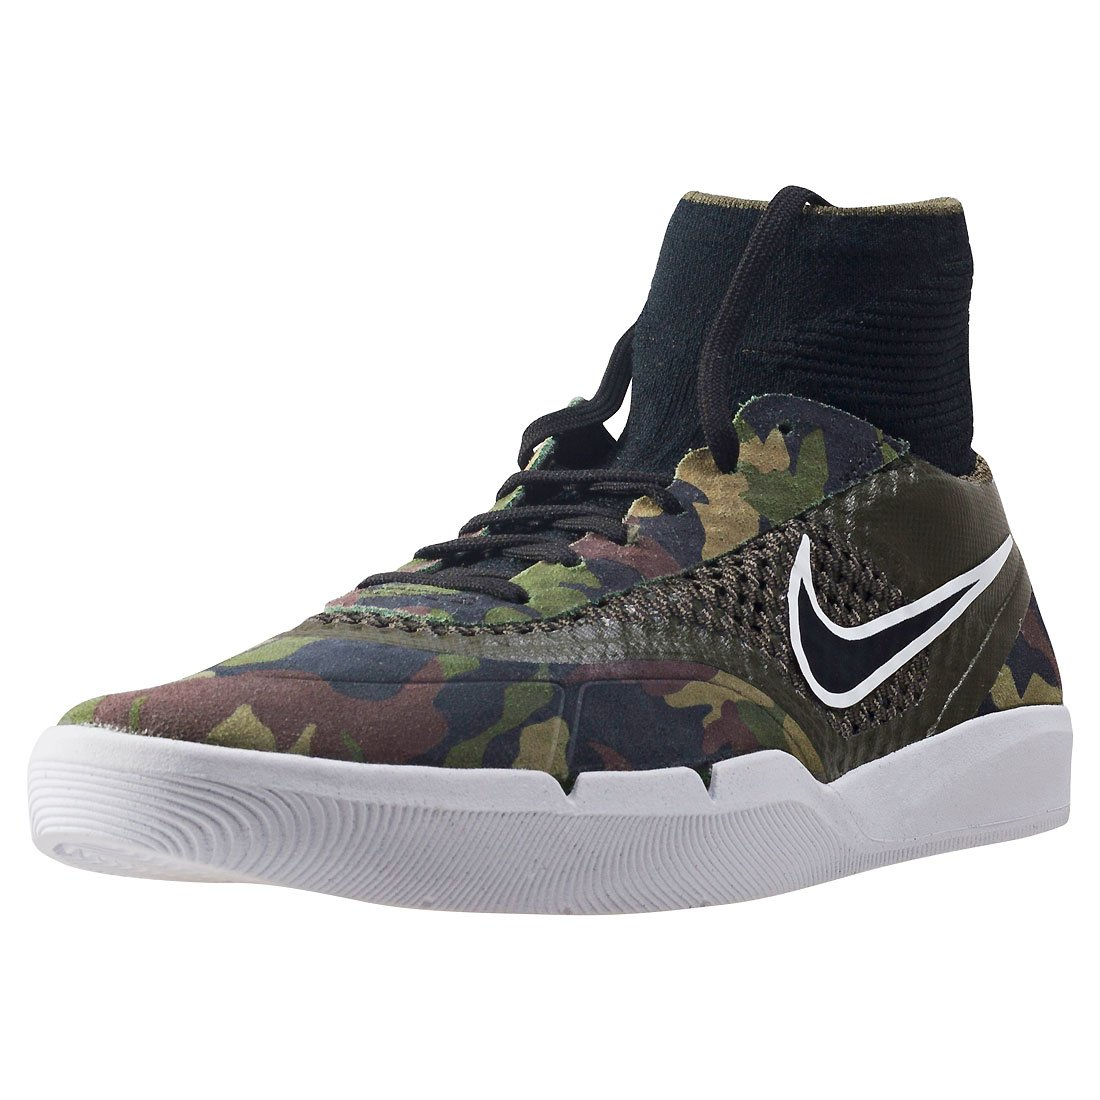 5694cefce418bf Nike SB Hyperfeel Koston 3 Mens Trainers  Amazon.co.uk  Shoes   Bags